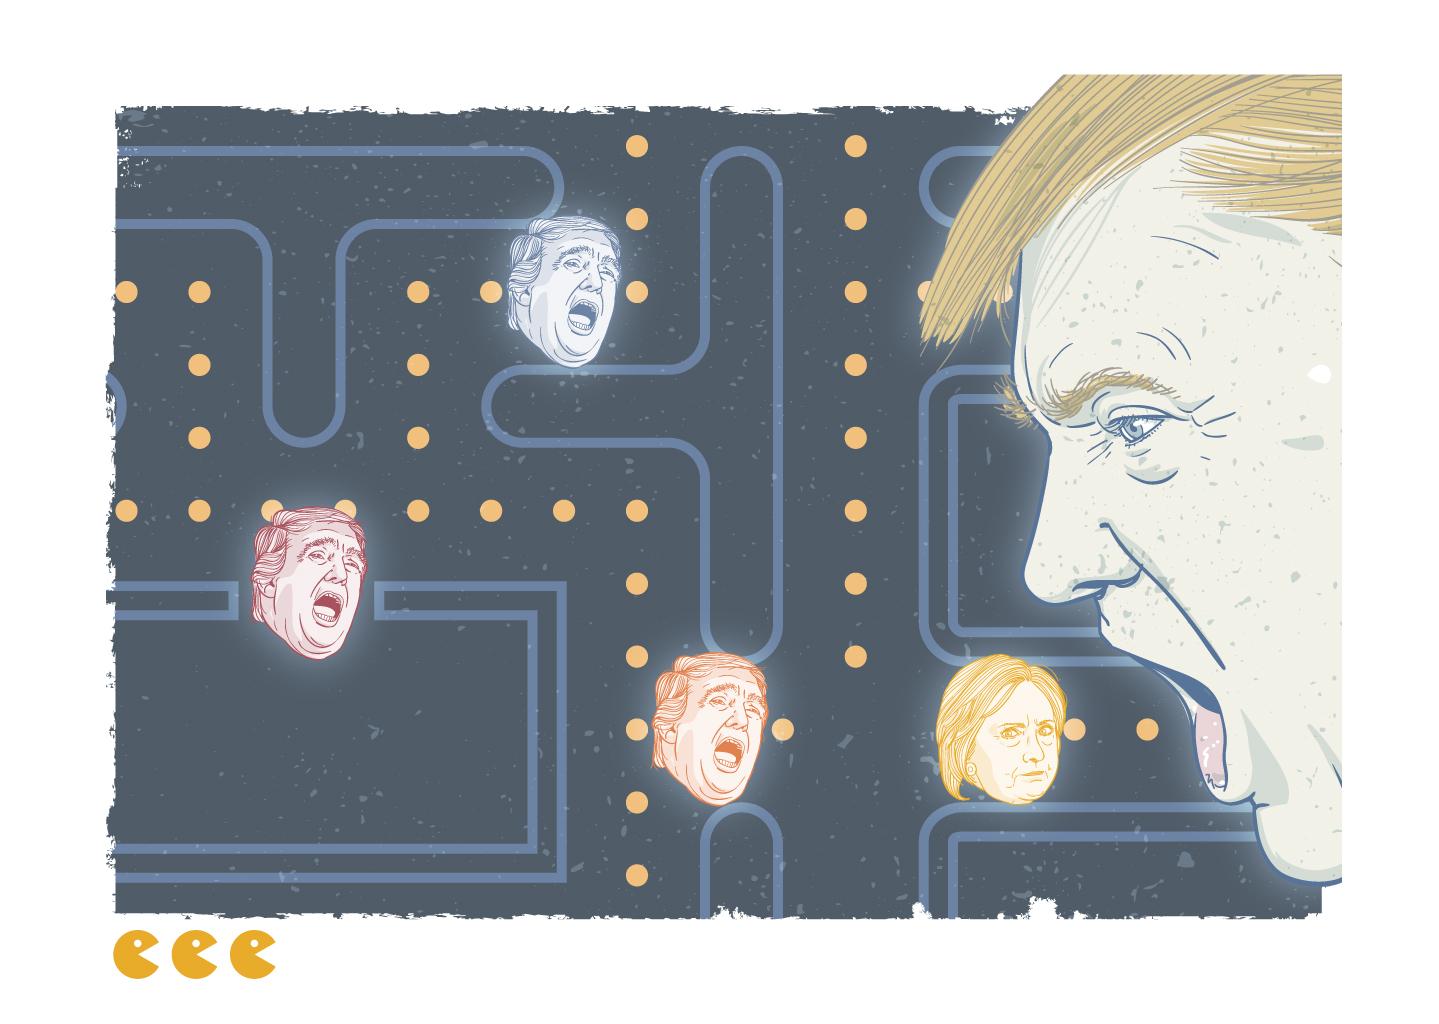 Clinton_trump_Pacman.jpg